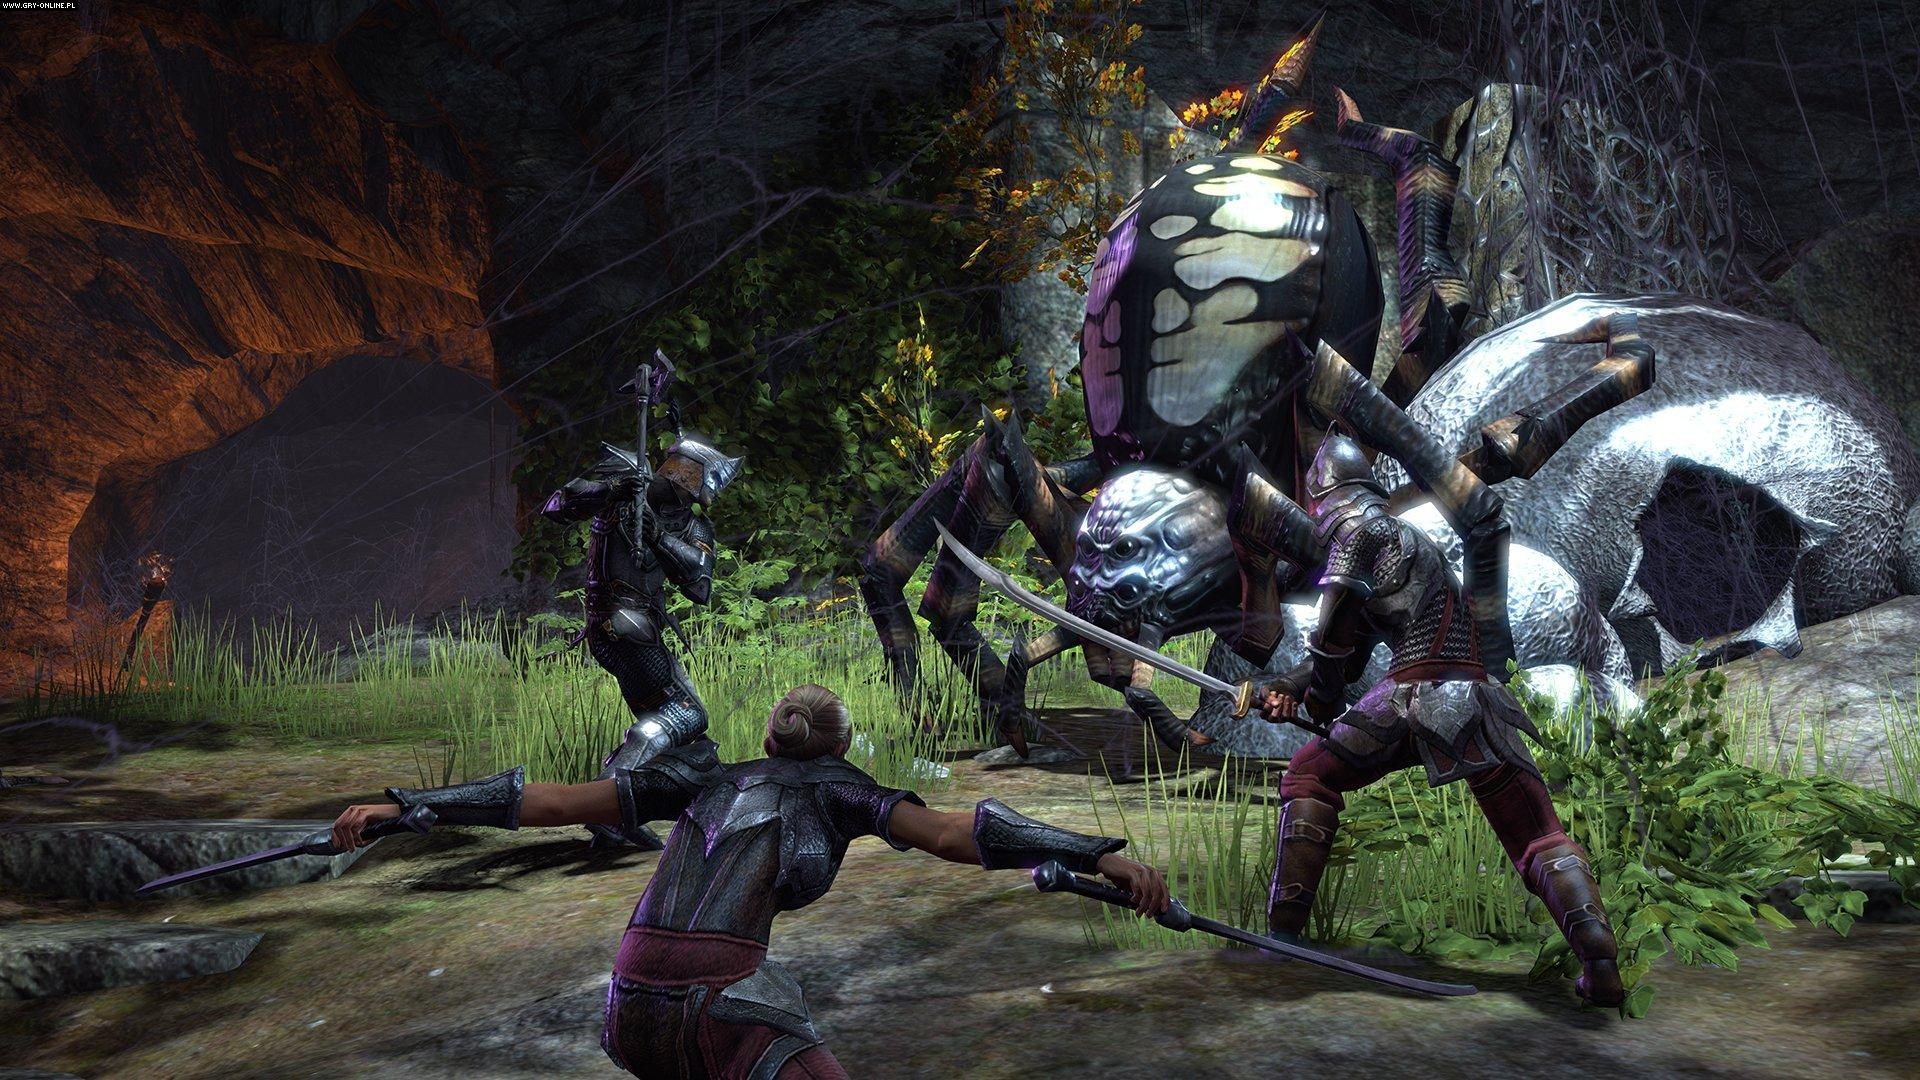 The Elder Scrolls Online Full HD Wallpaper and Background